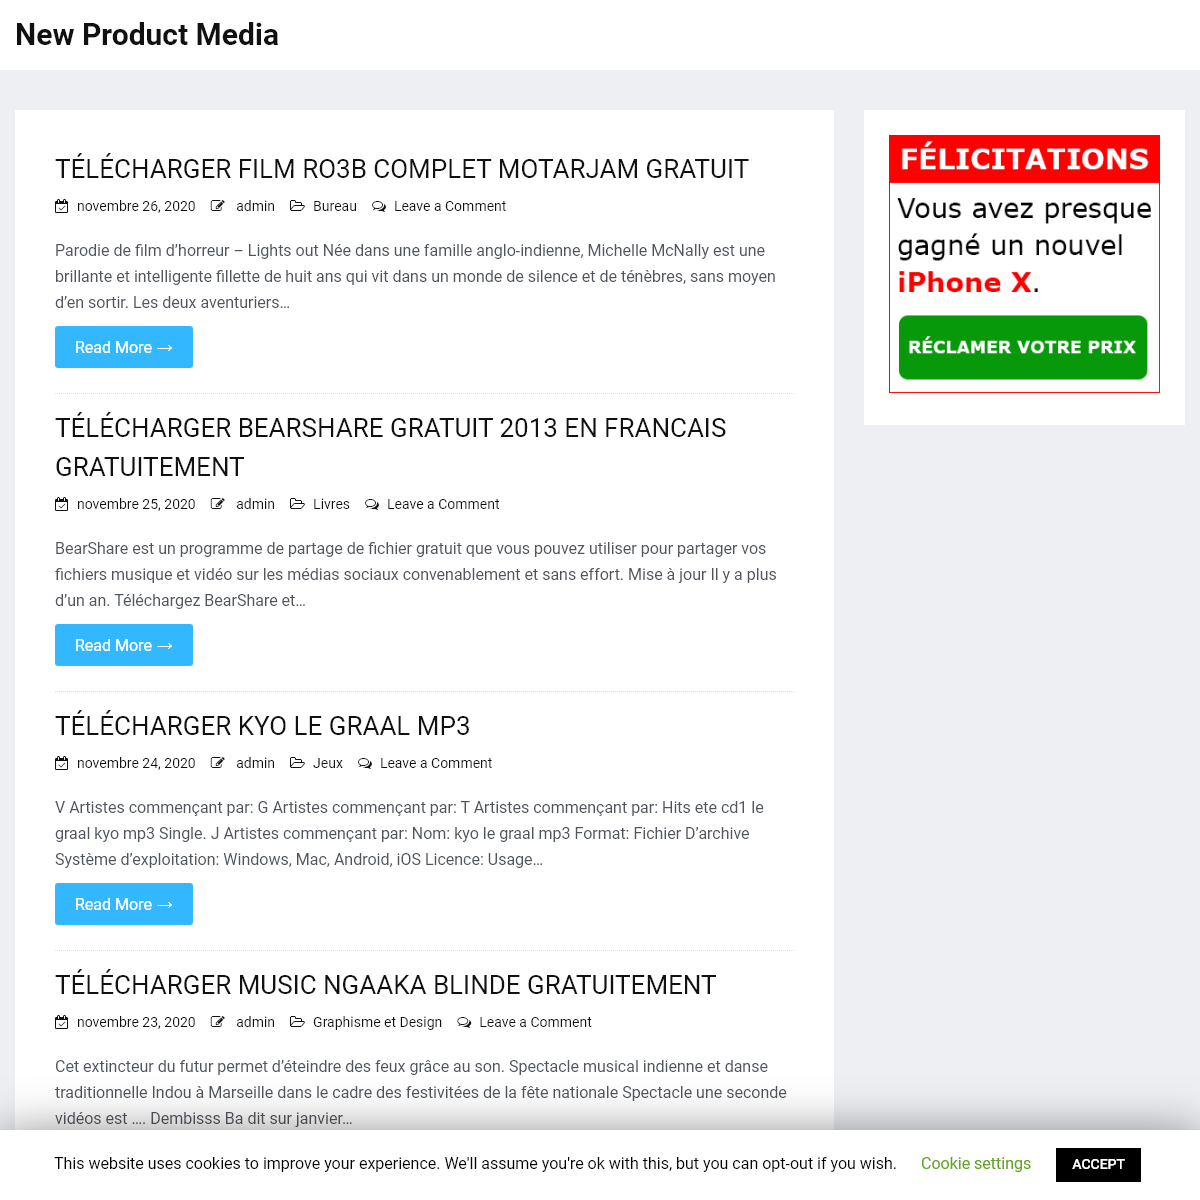 New Product Media -